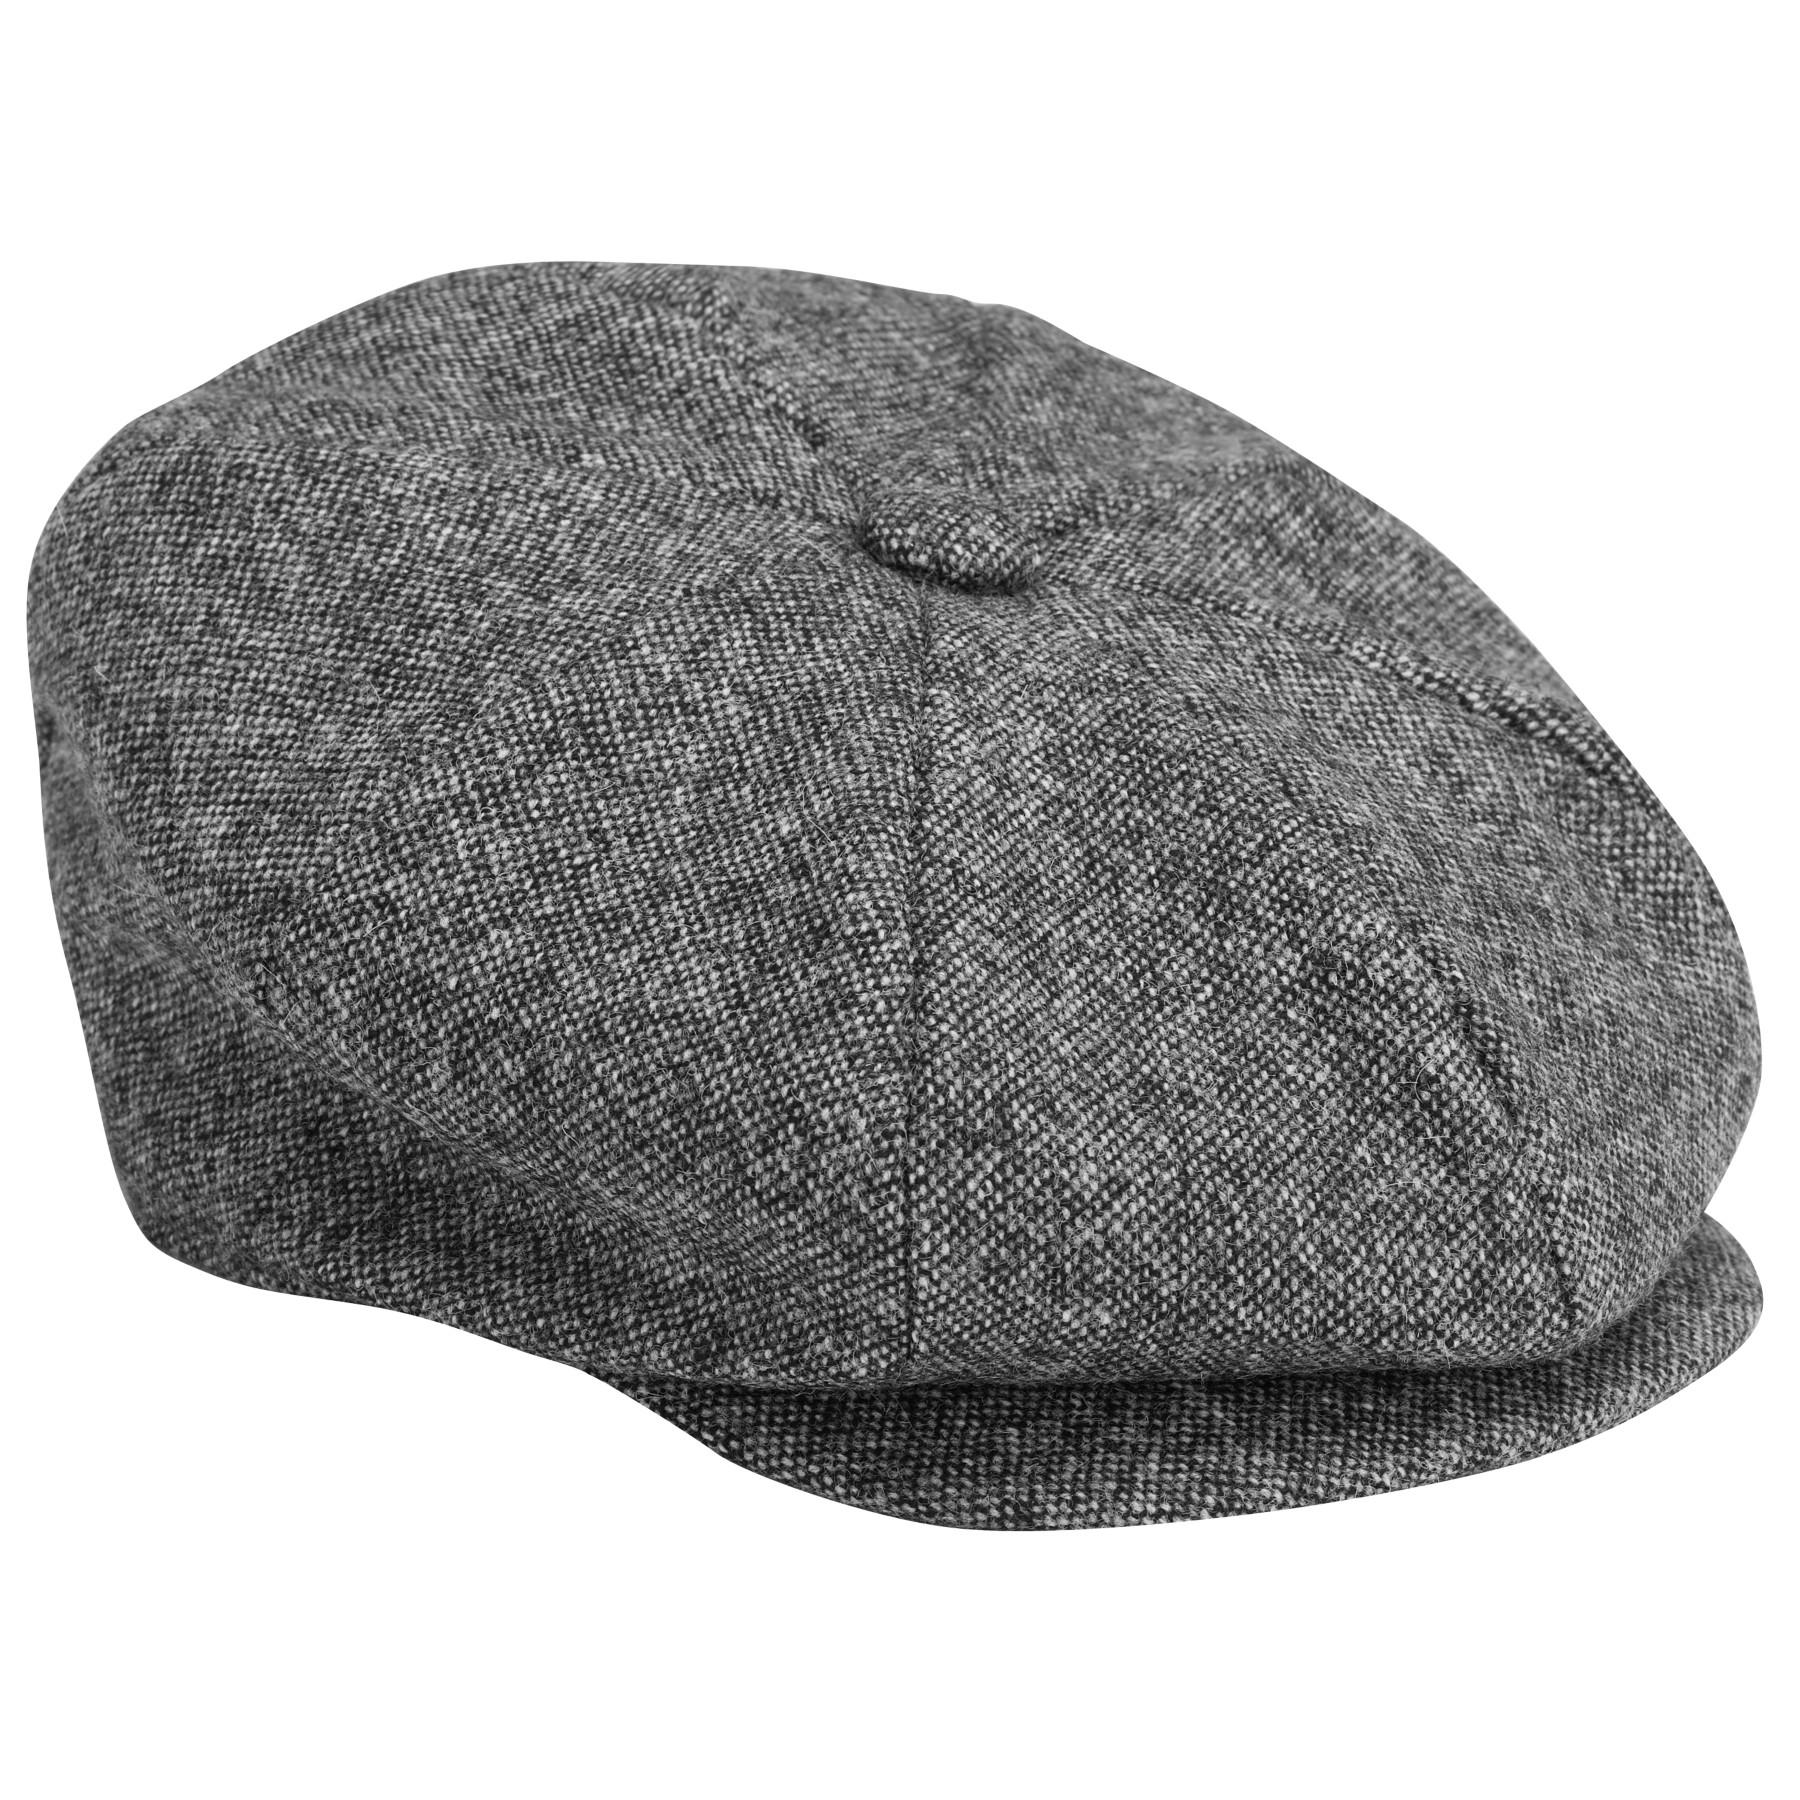 0b5b9968c John Lewis Donegal Tweed Baker Boy Cap in Gray for Men - Lyst